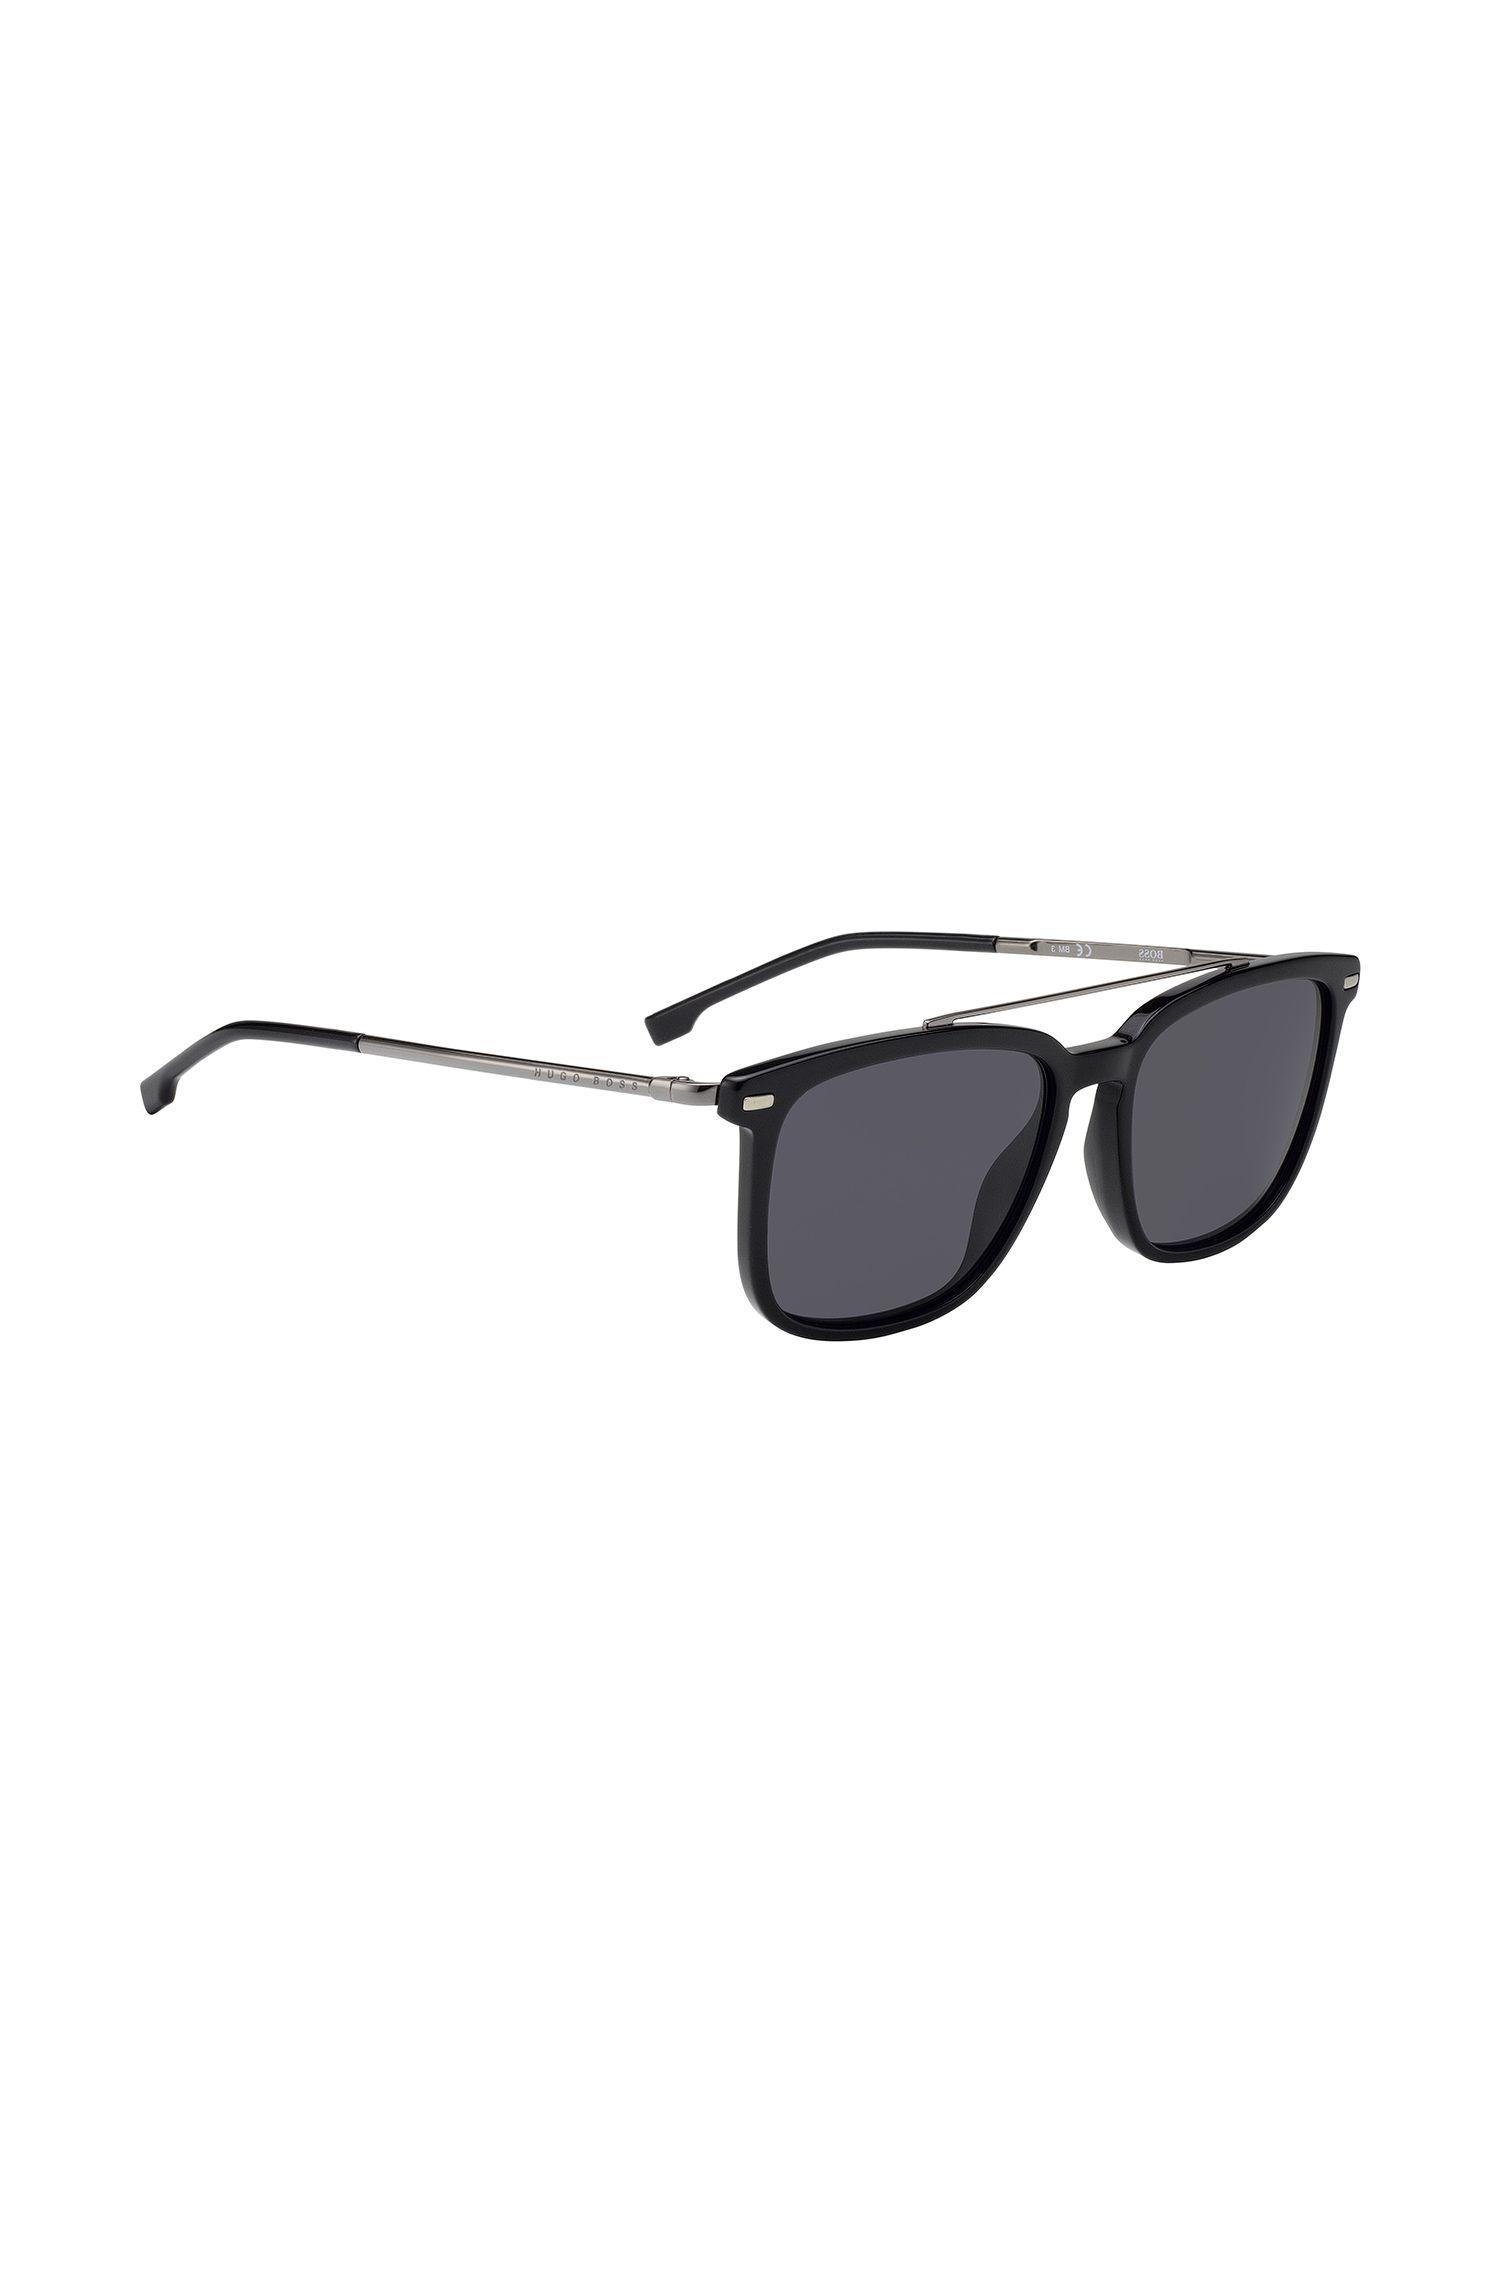 Ultralight sunglasses in metal and matte acetate